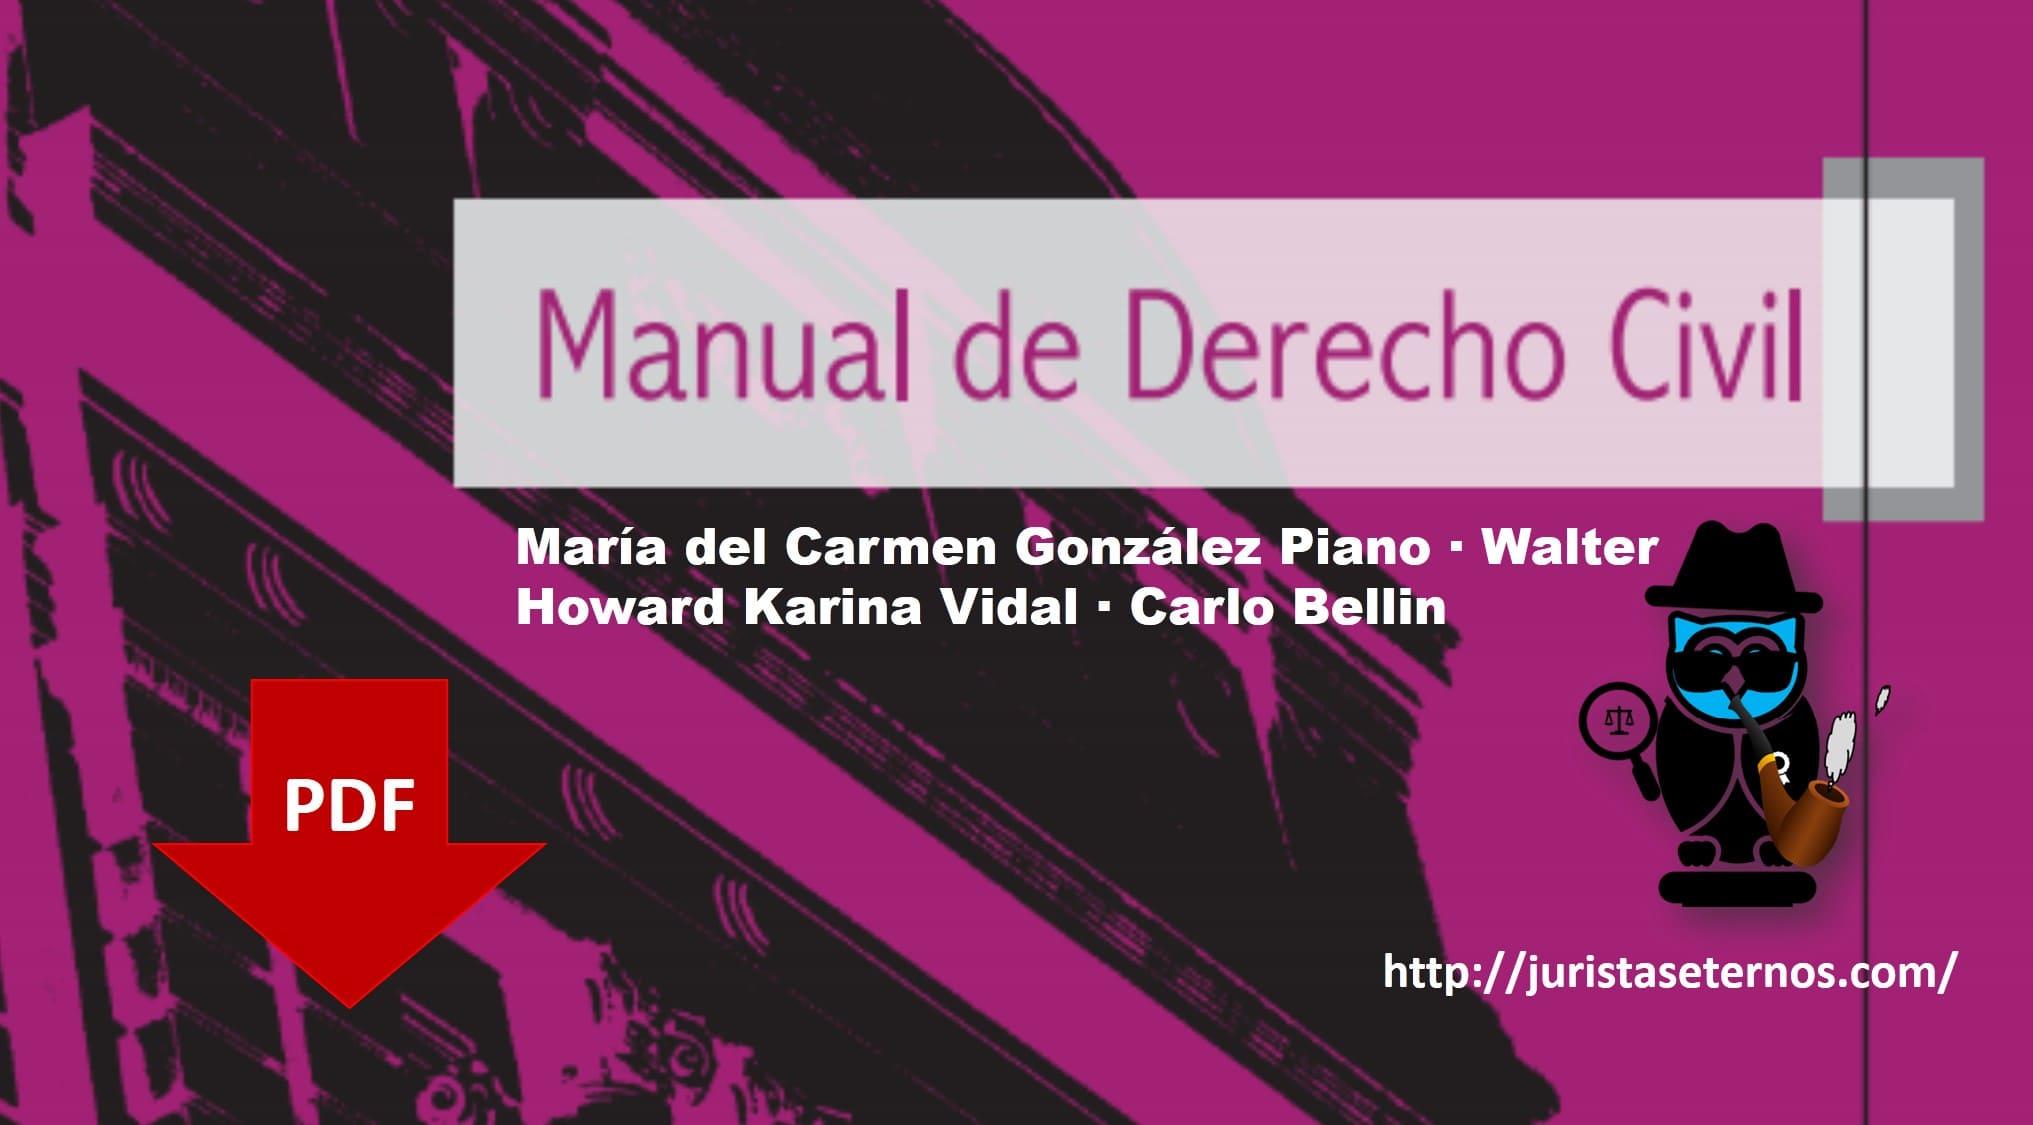 manual de derecho civil gonzalez piano